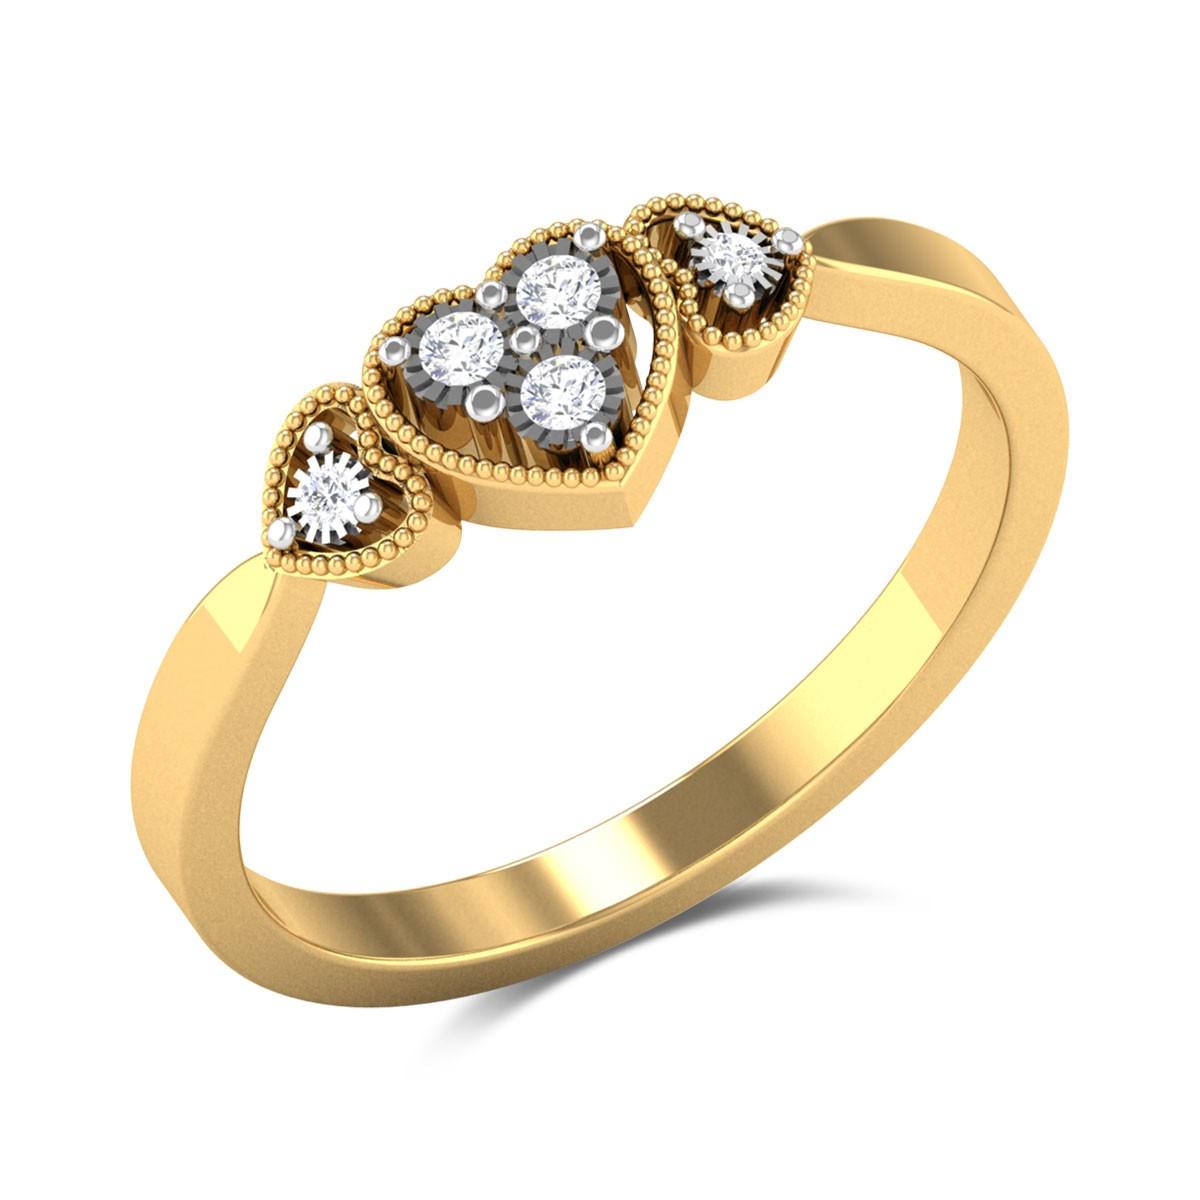 Soiree Diamond Ring